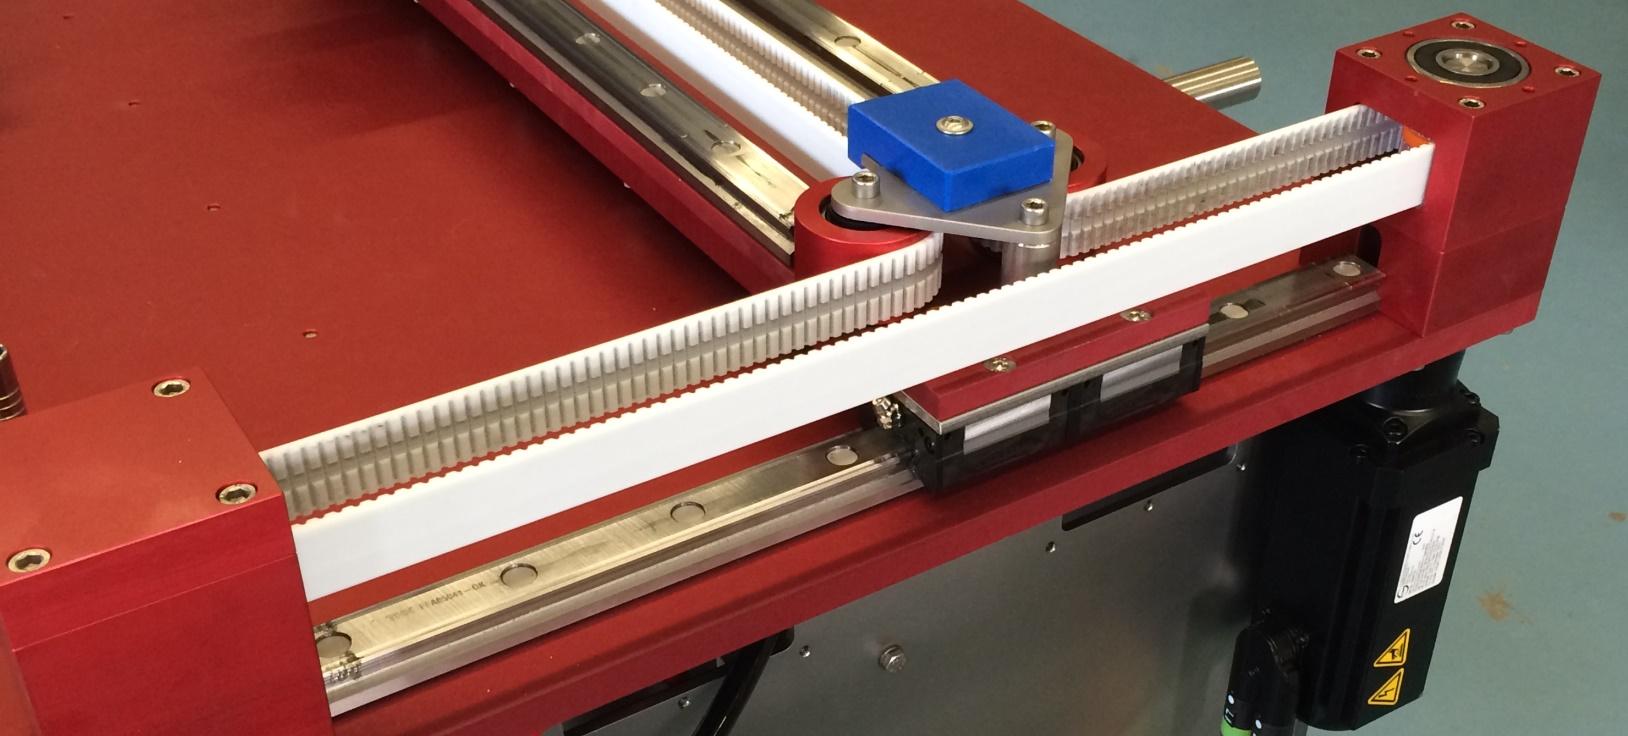 Single belt gantry system for positioning of a spray